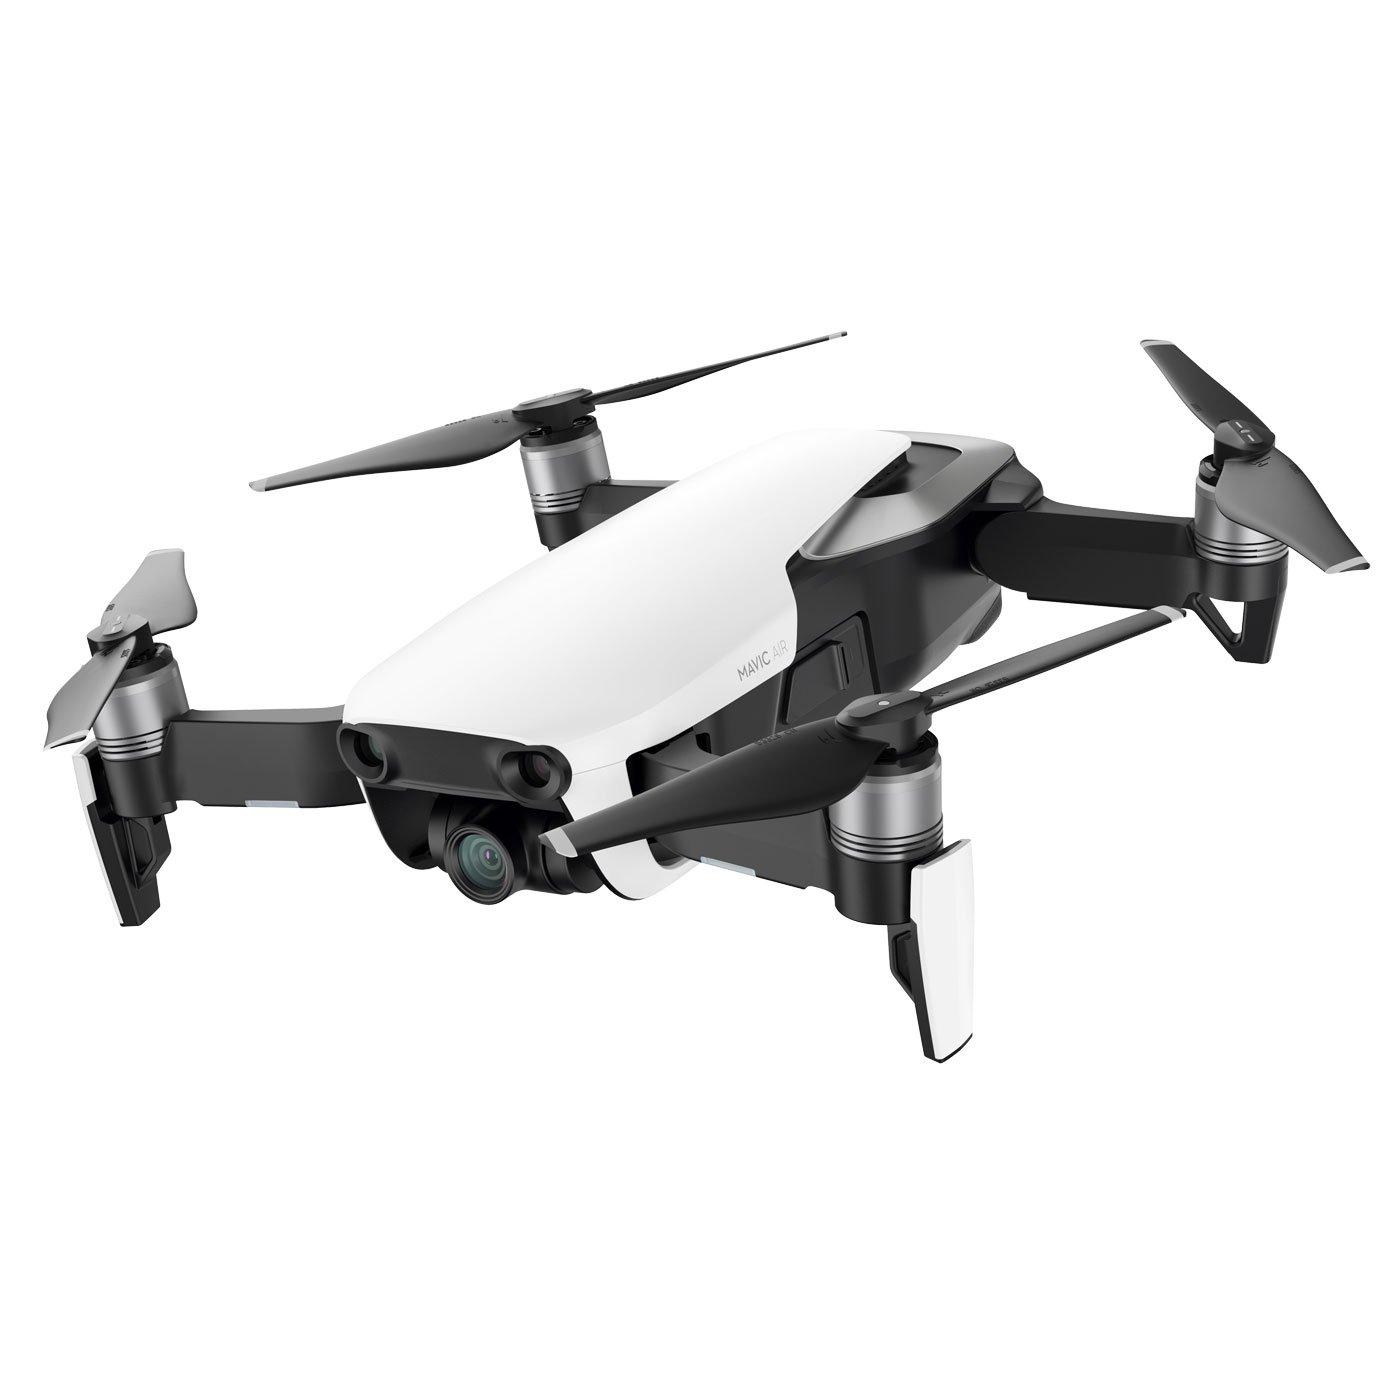 Drone DJI Mavic Air - Blanc Arctique + 174.25€ en SuperPoints (via l'application)